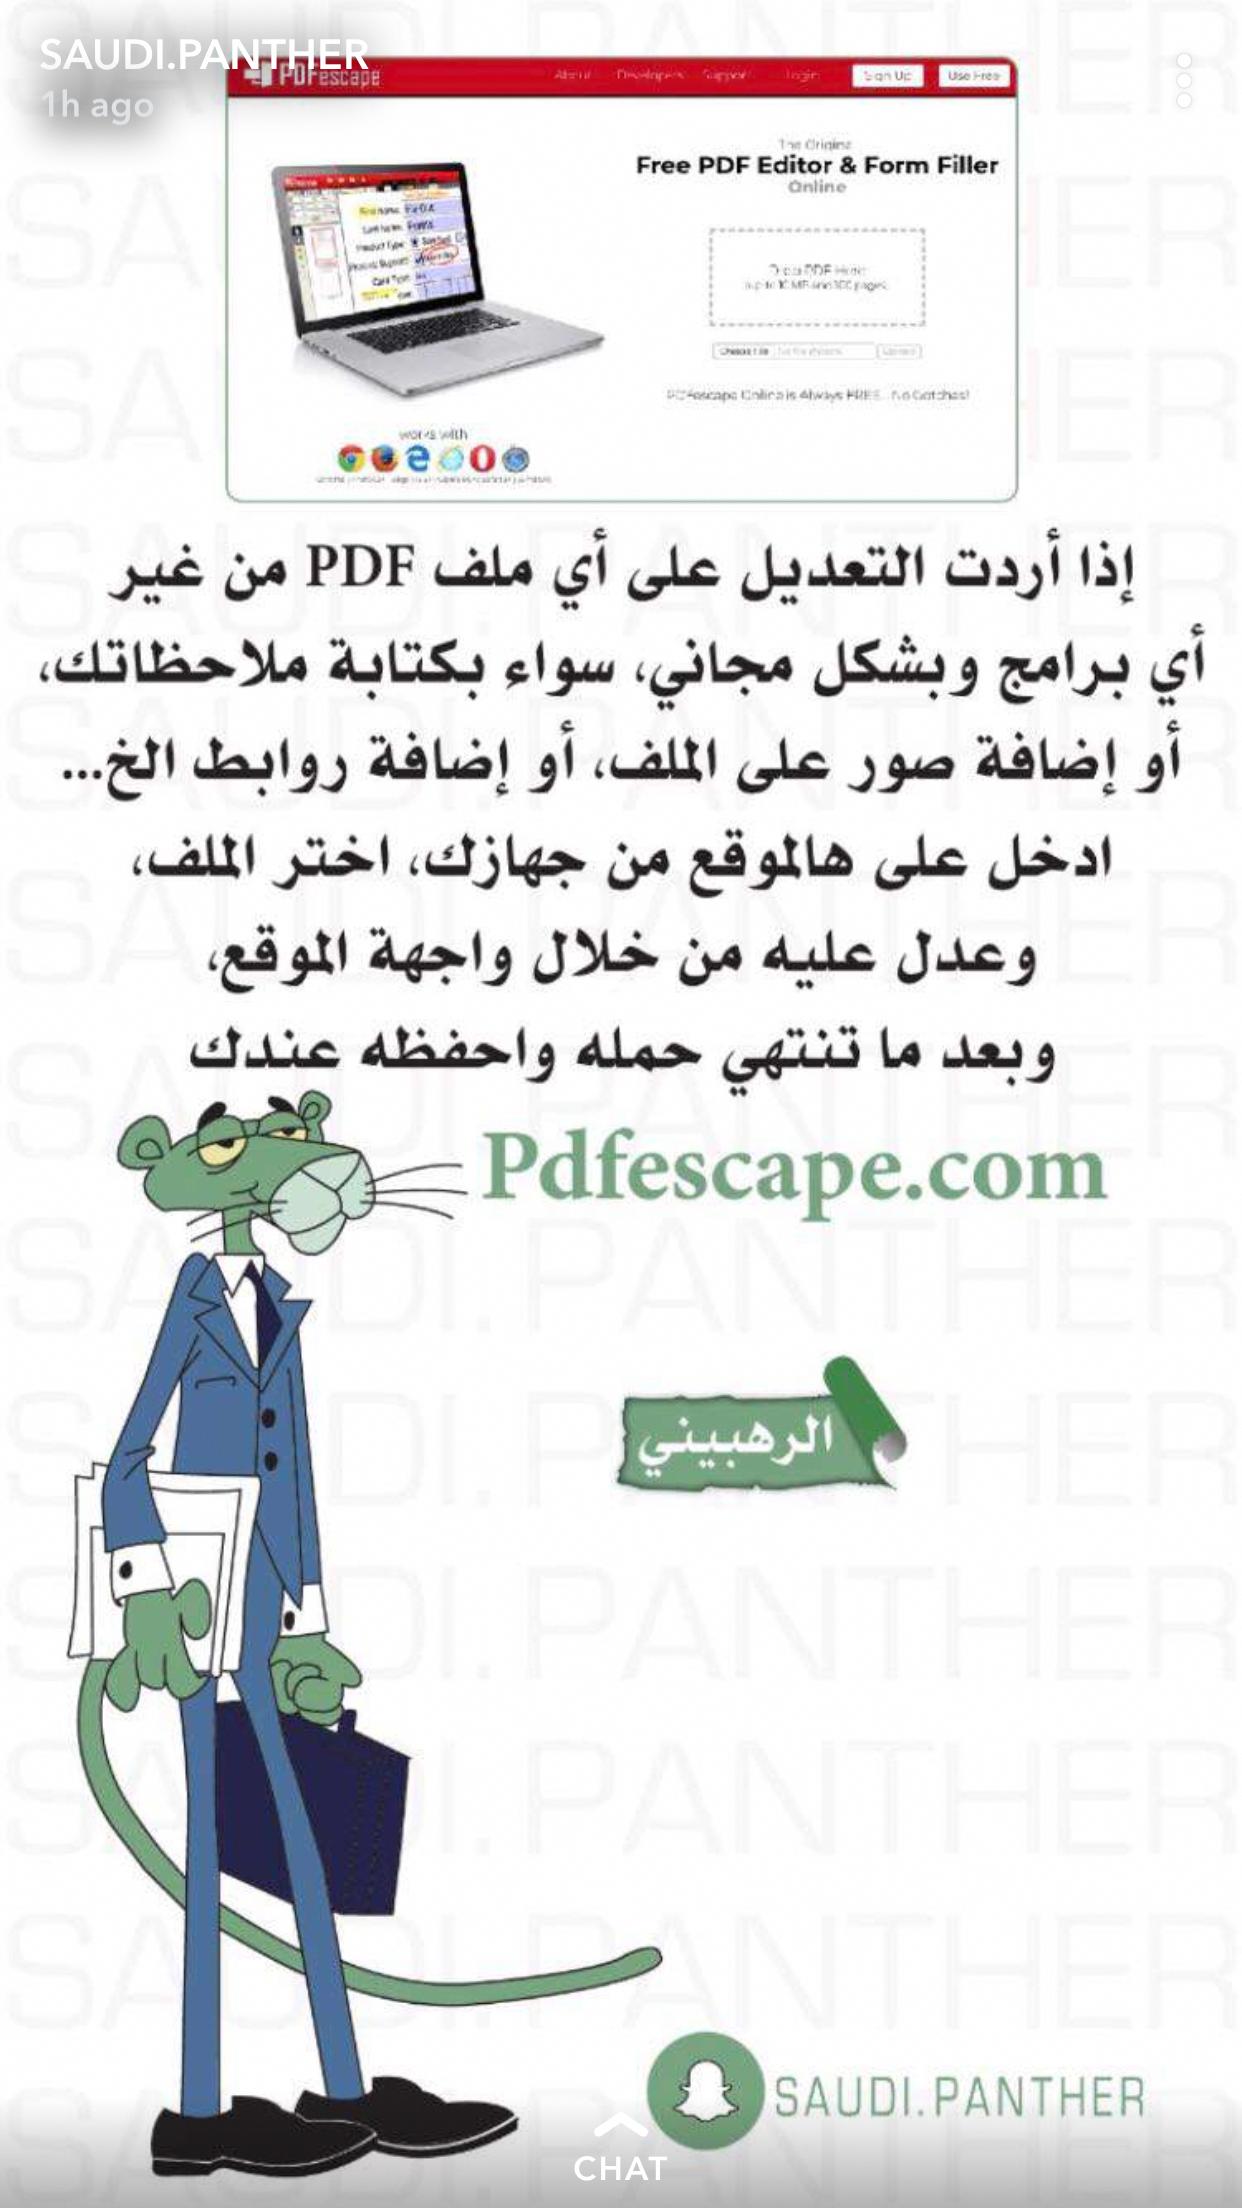 Pin By Mohamed Ez On البانثر السعودي Learning Websites Programming Apps Web Marketing